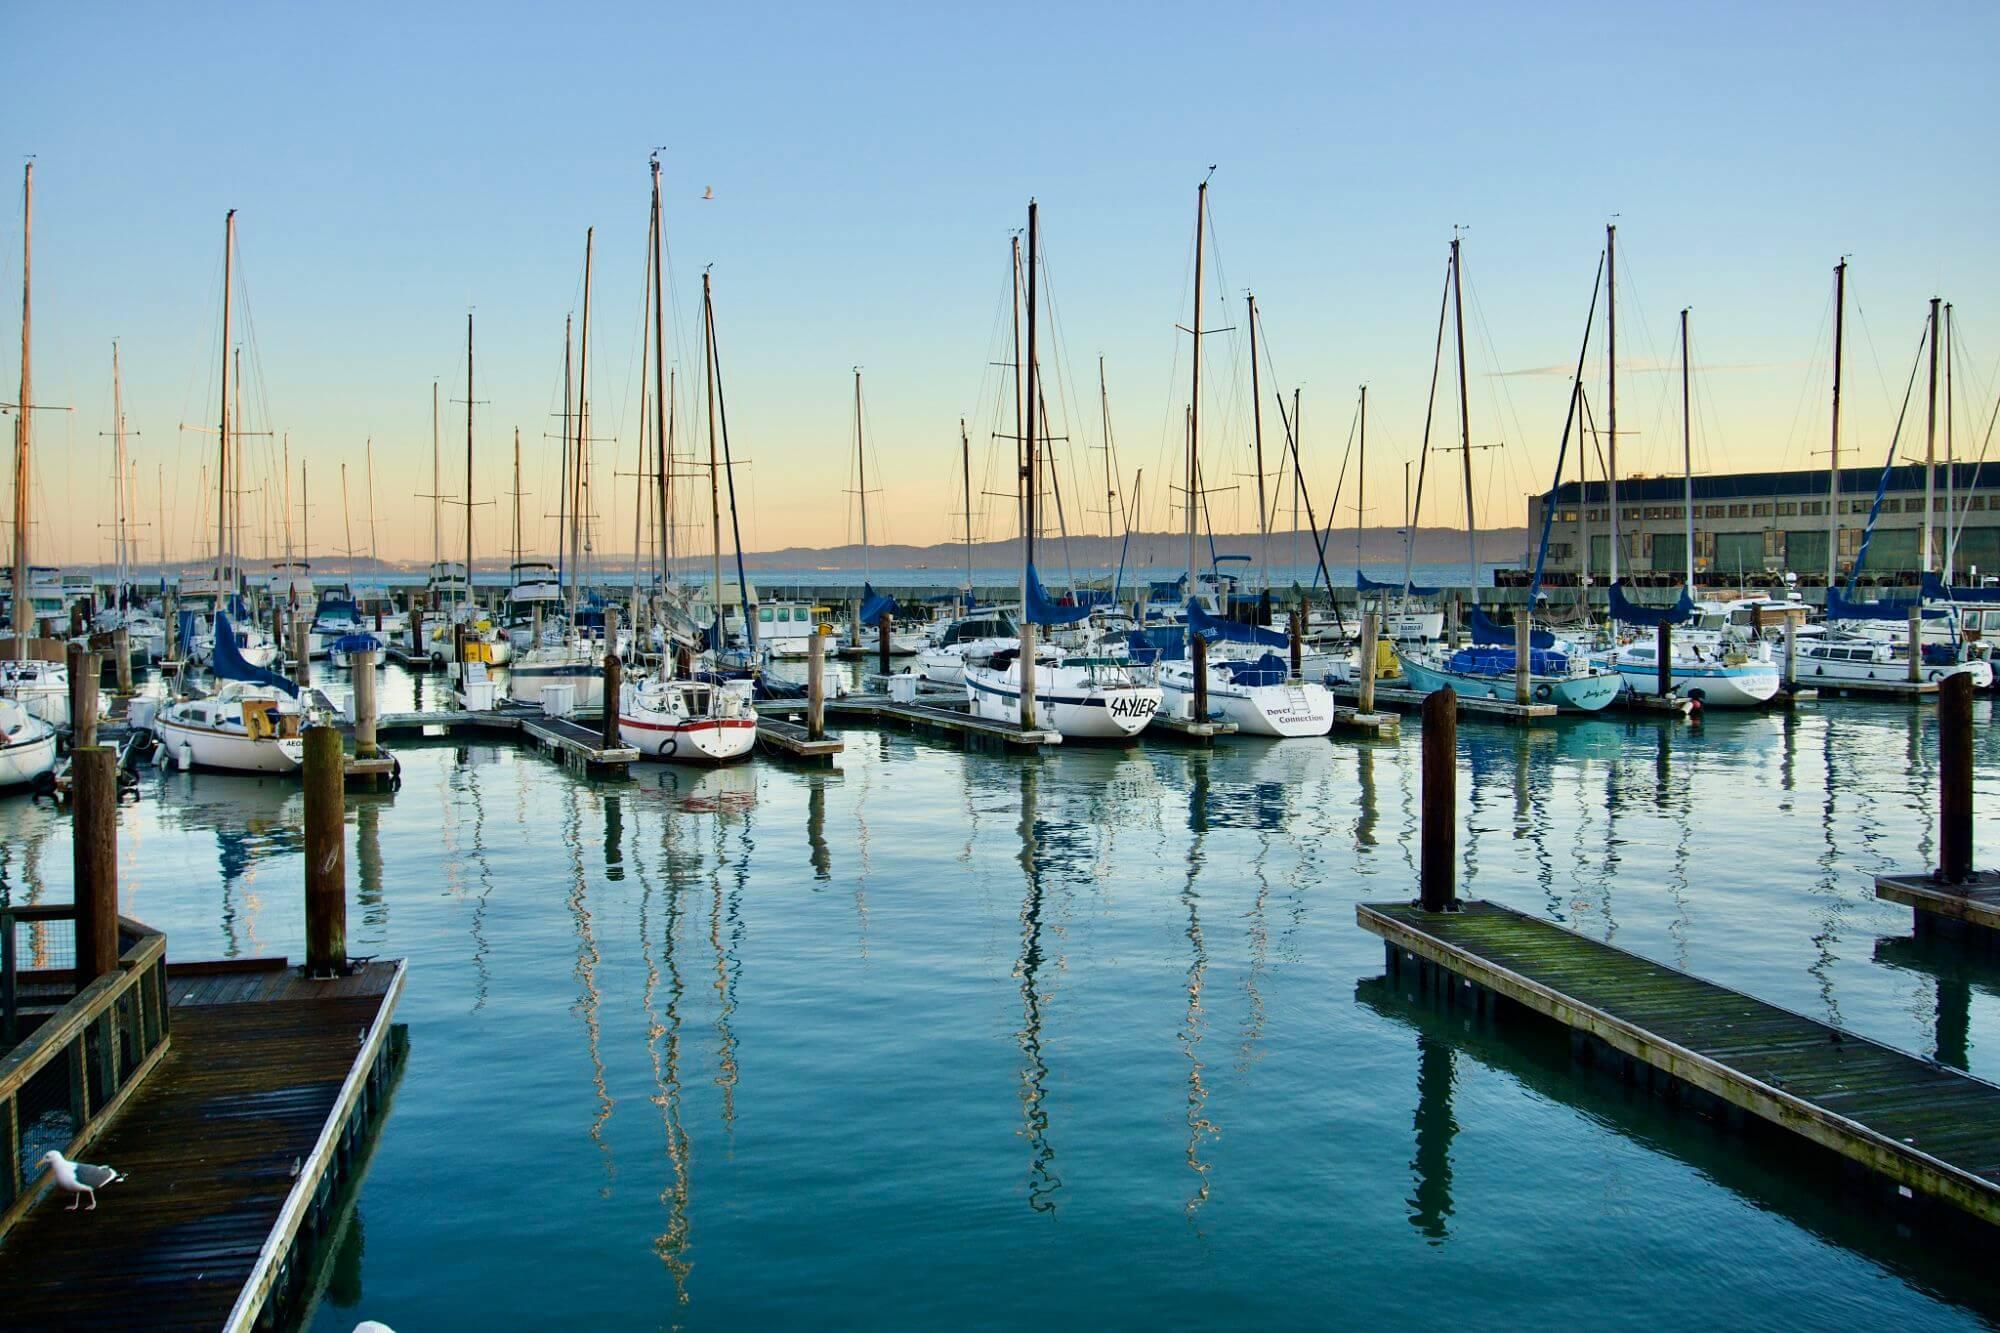 Boats docked in San Francisco Bay